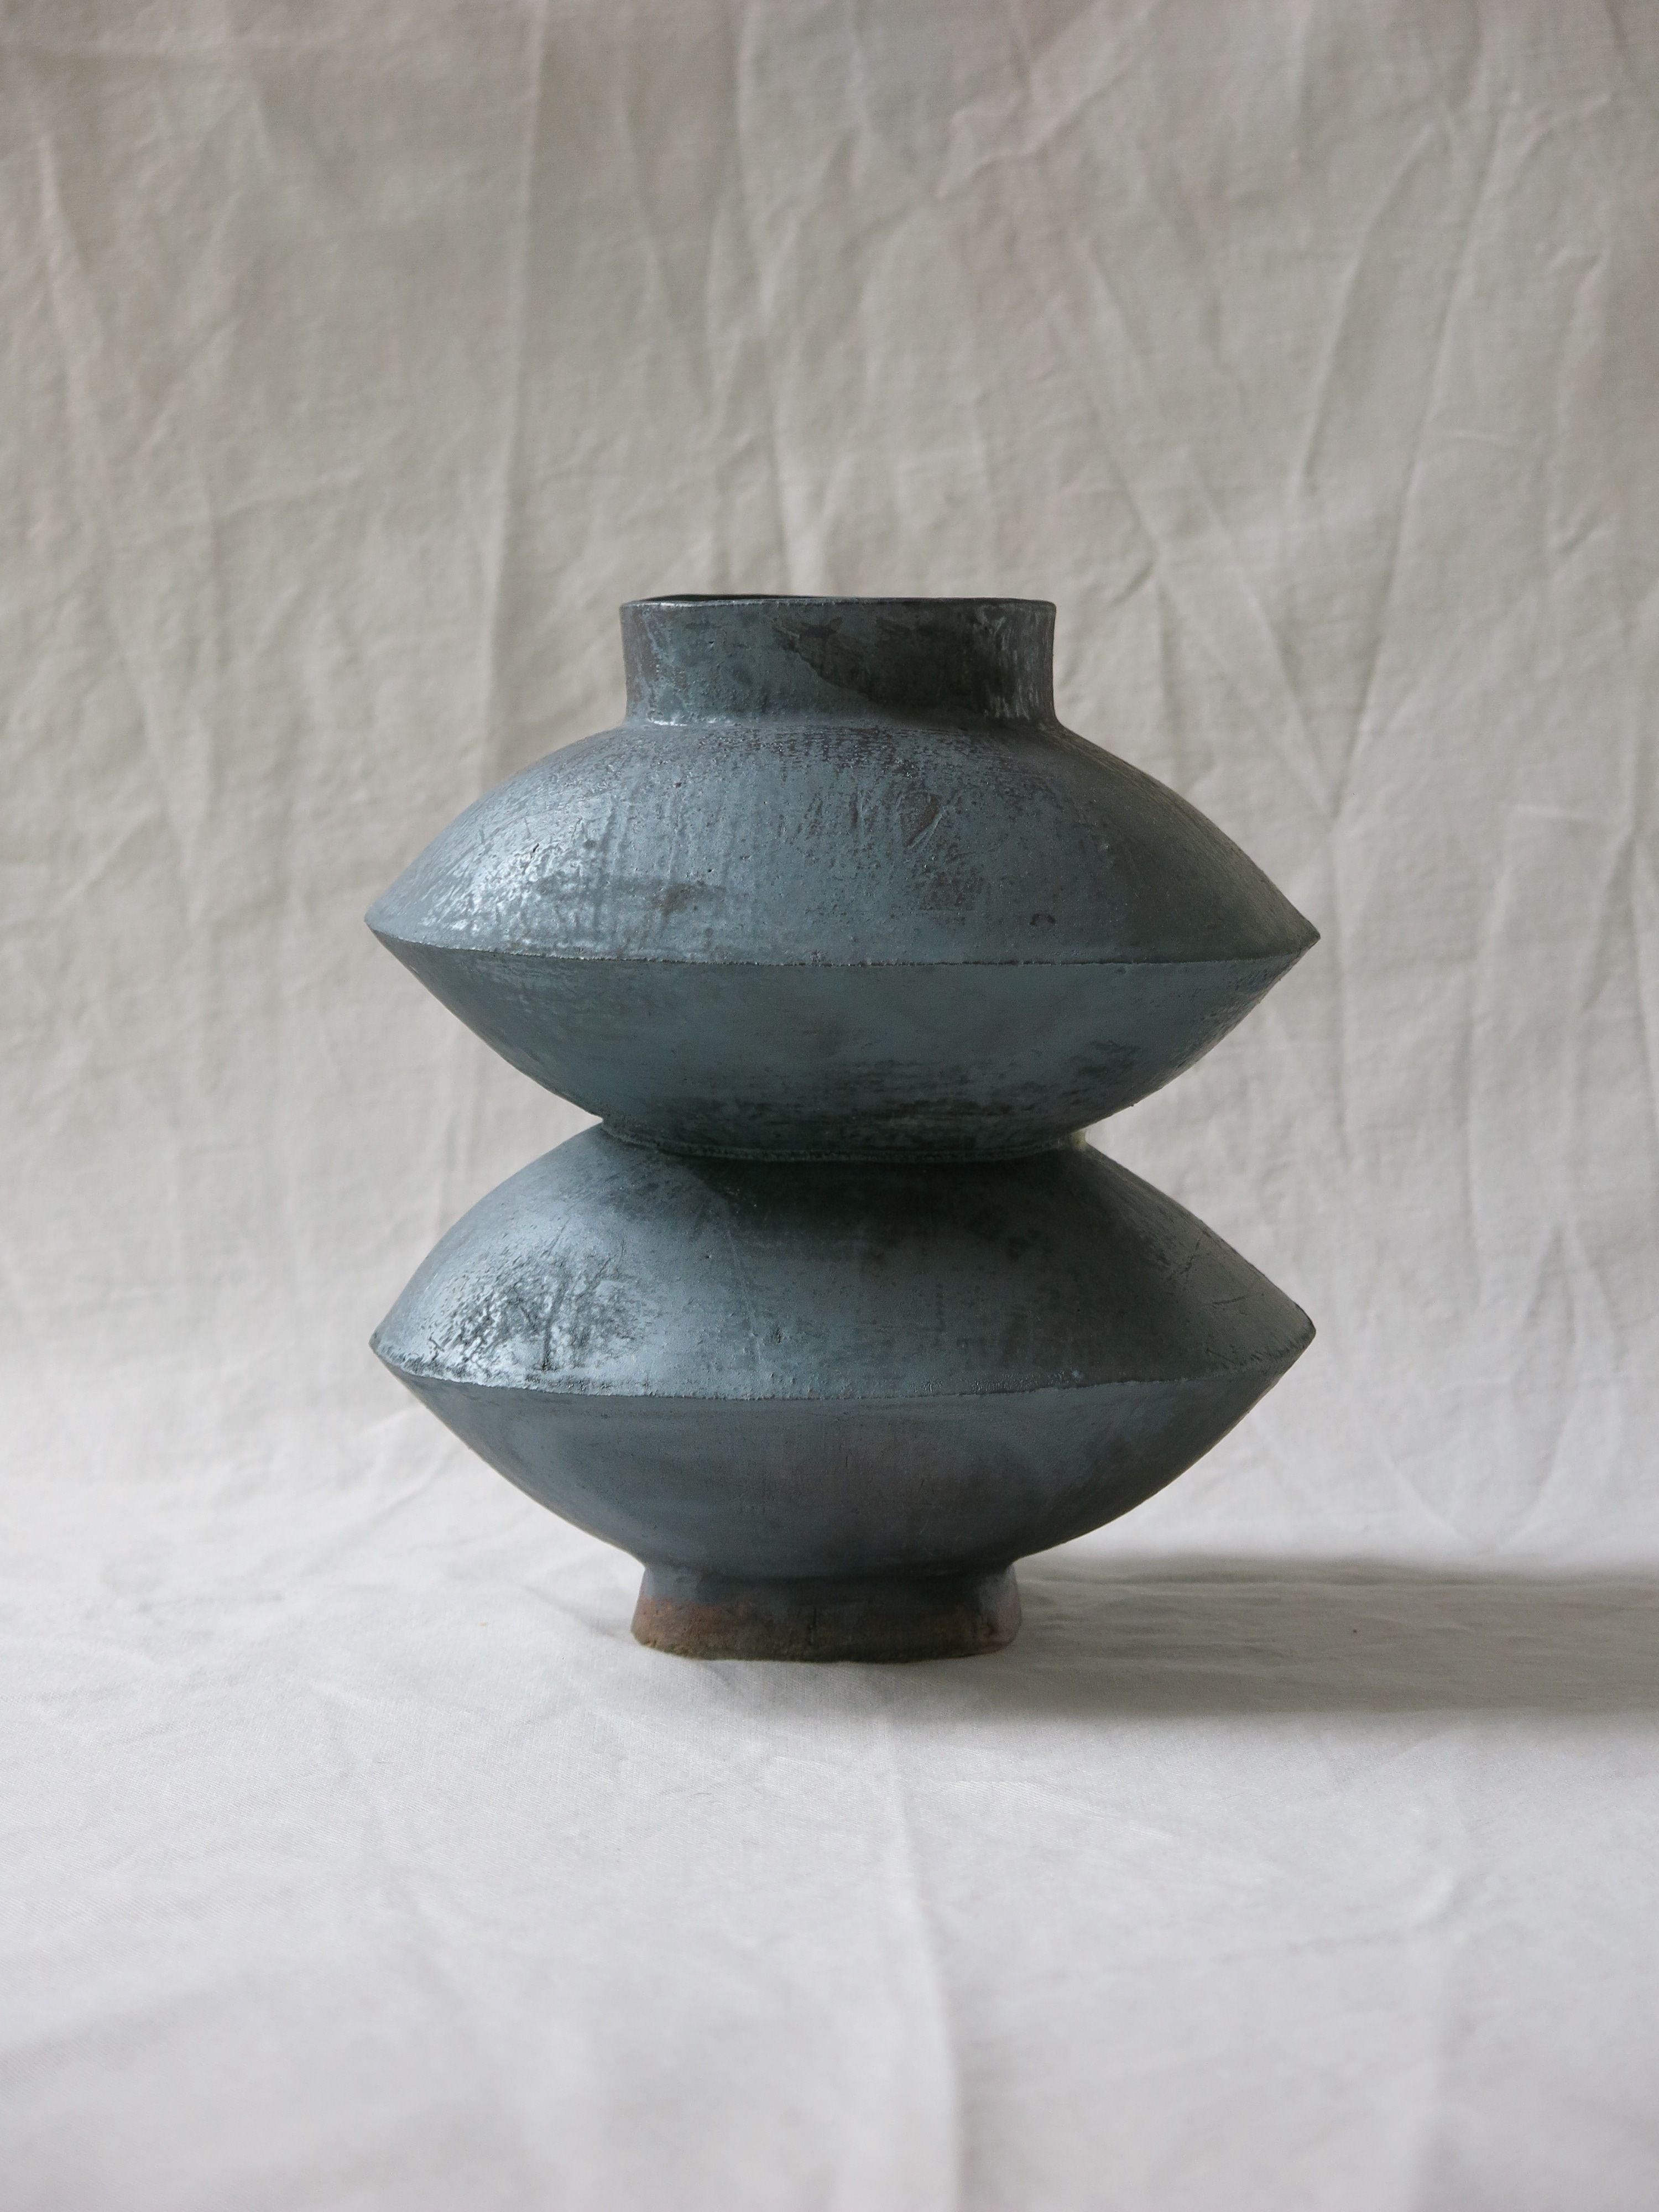 Dbl vase handmade ceramic designed in brooklyn made in